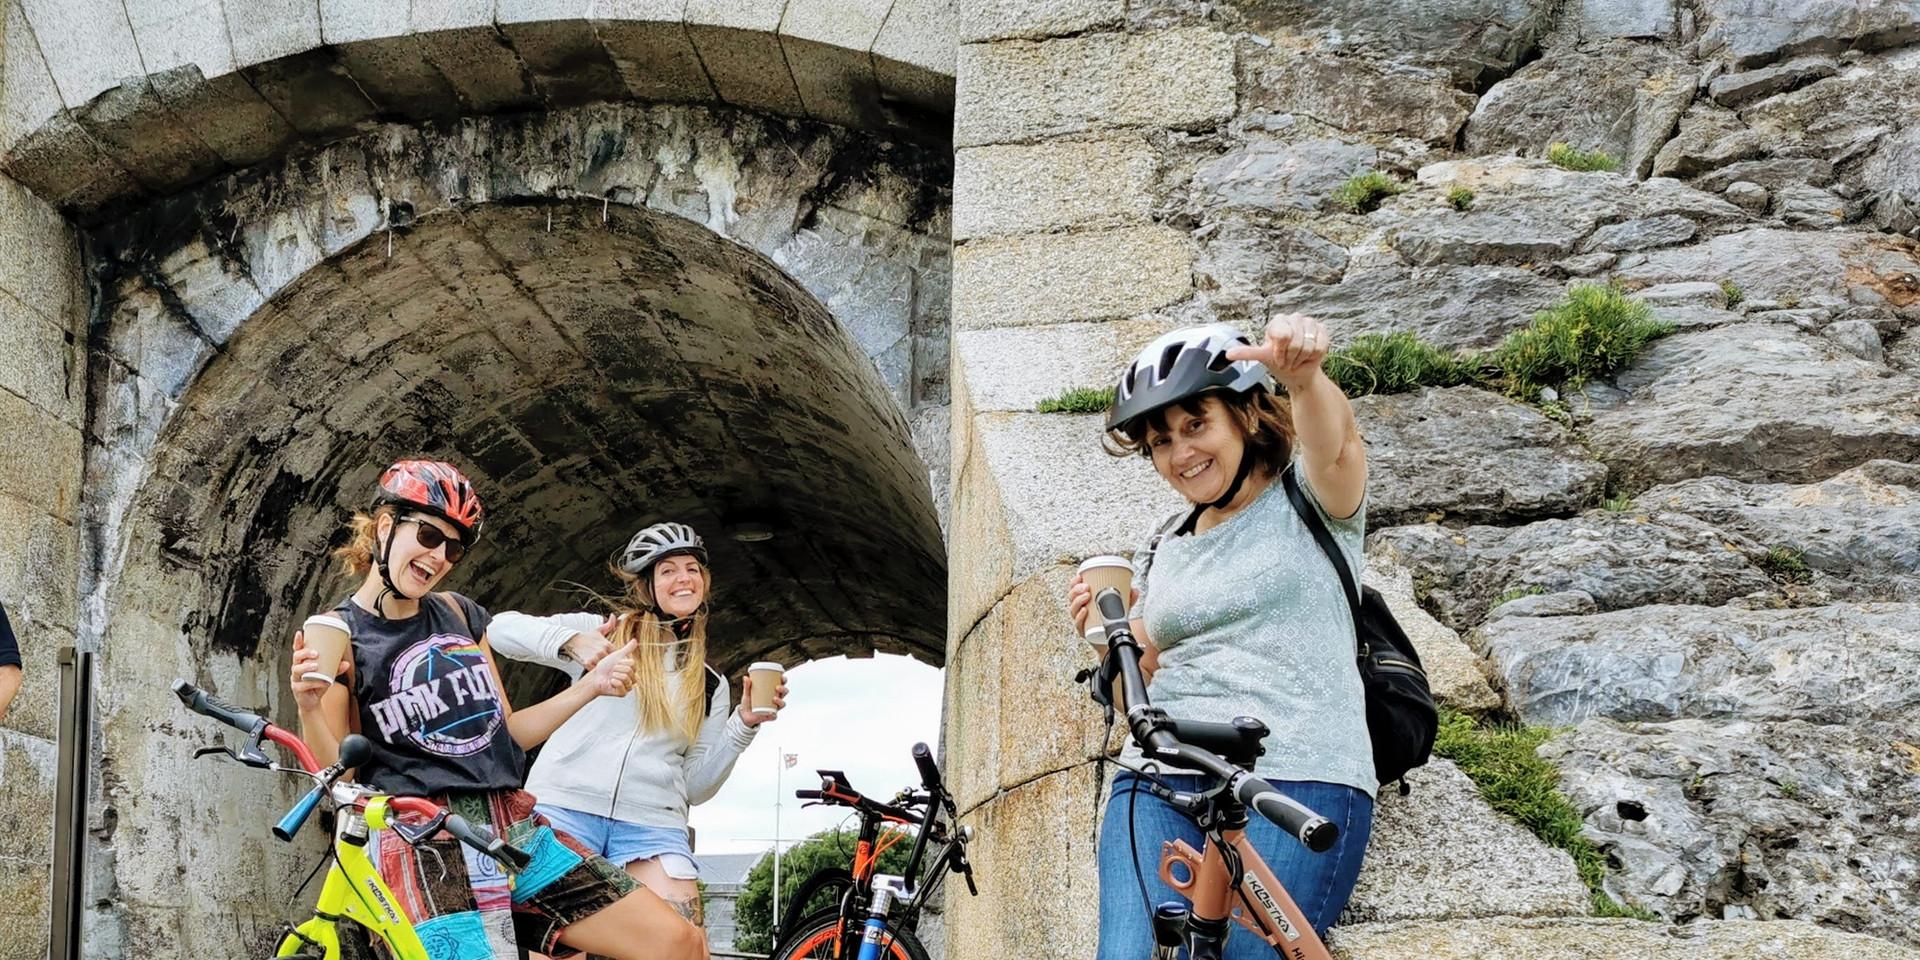 iScootbike Footbike UK - great fun for women